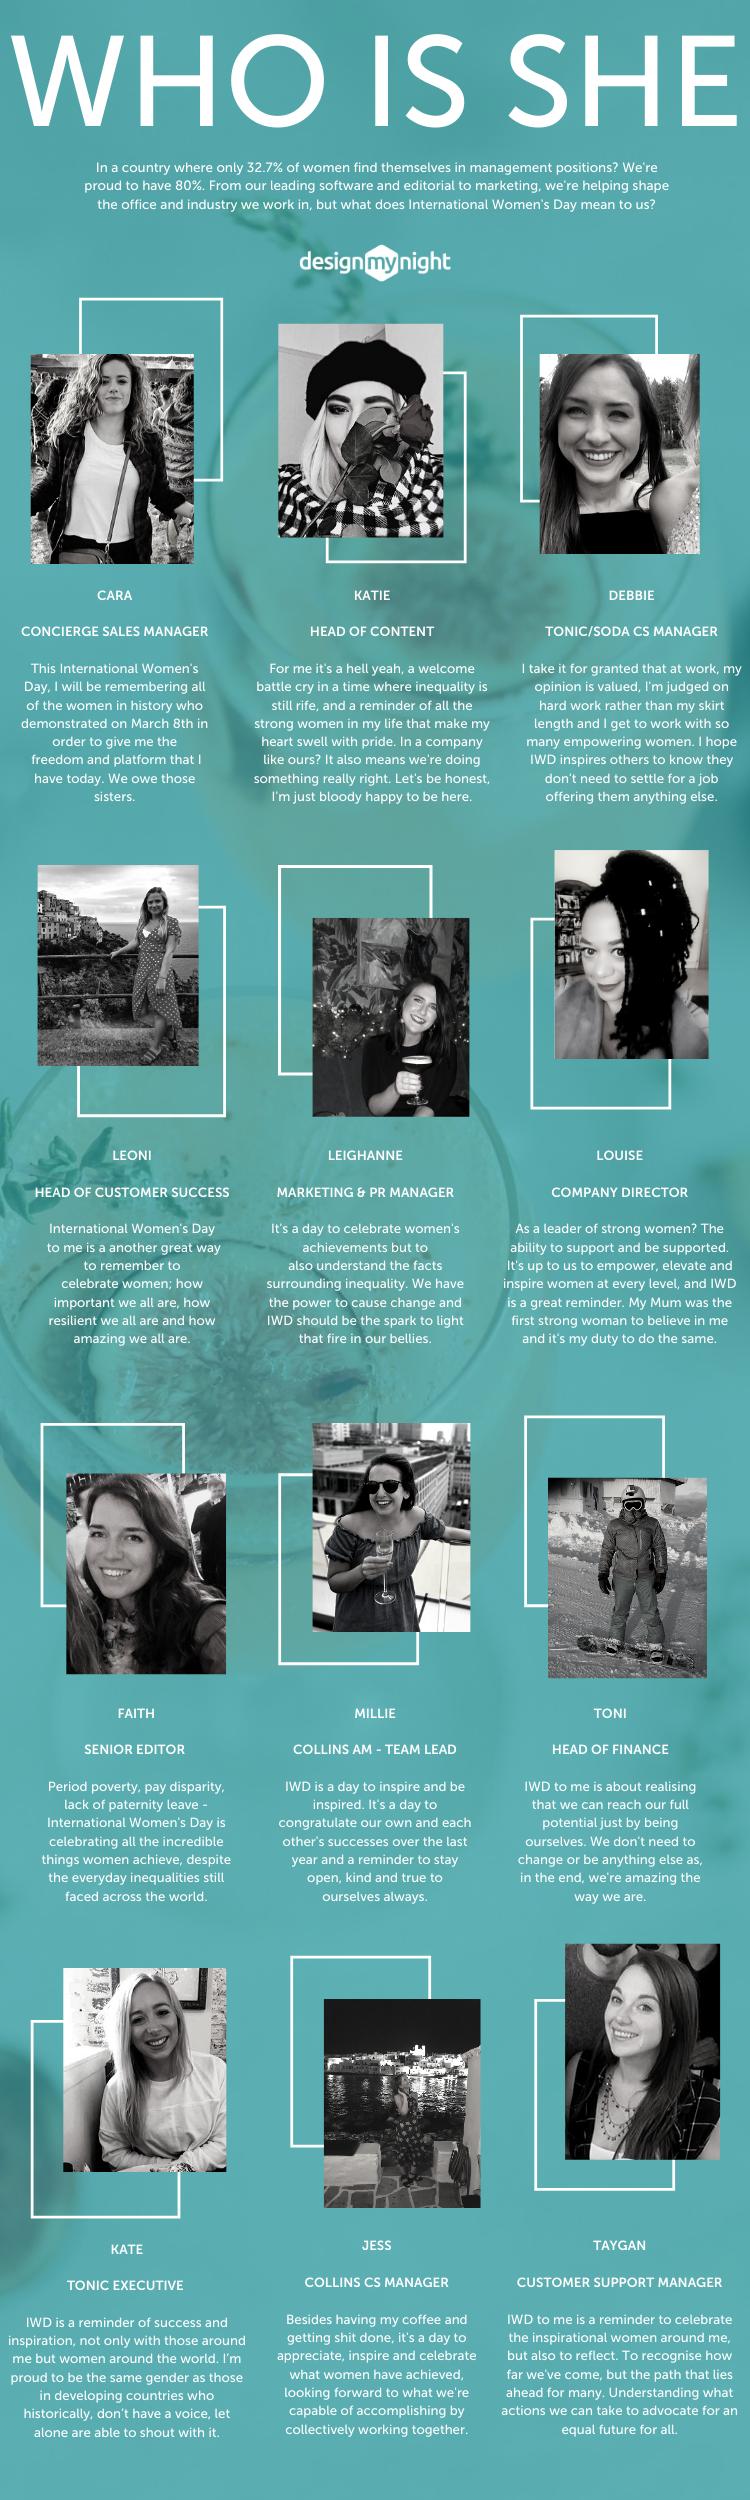 international women's day on designmynight